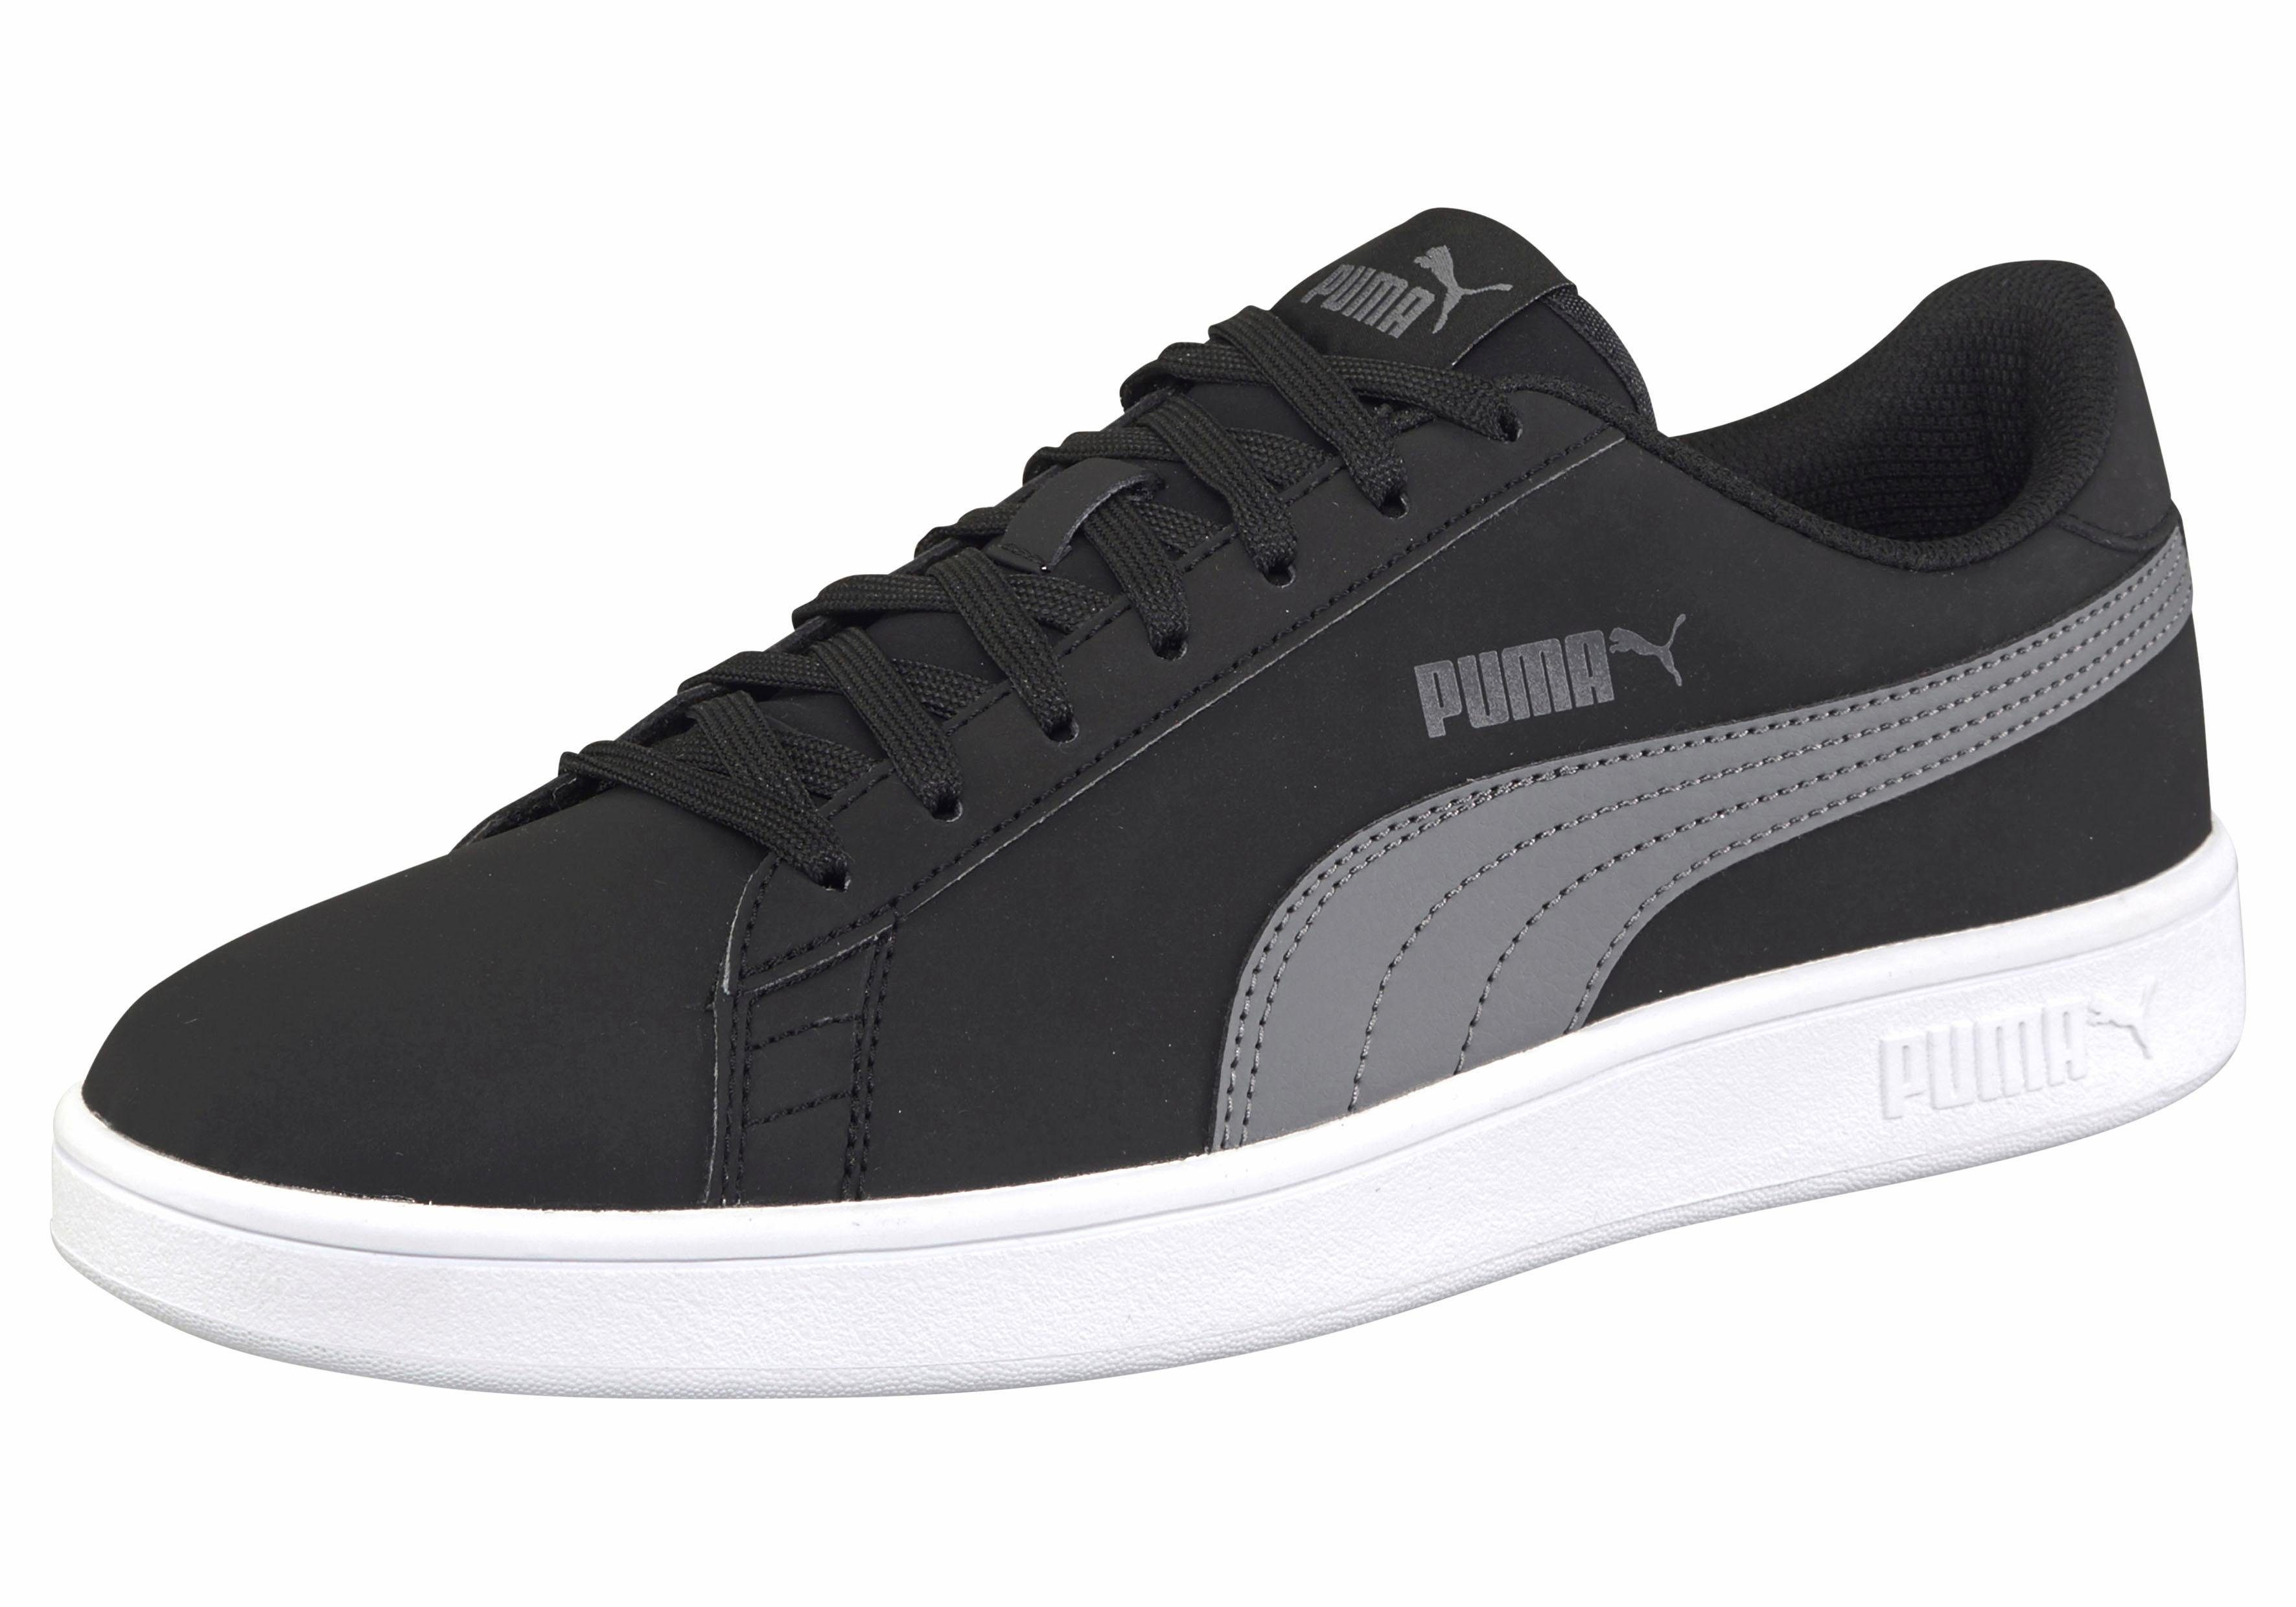 Pumas - Smash Baskets V2 - Hommes - Chaussures - Noir - 44,5